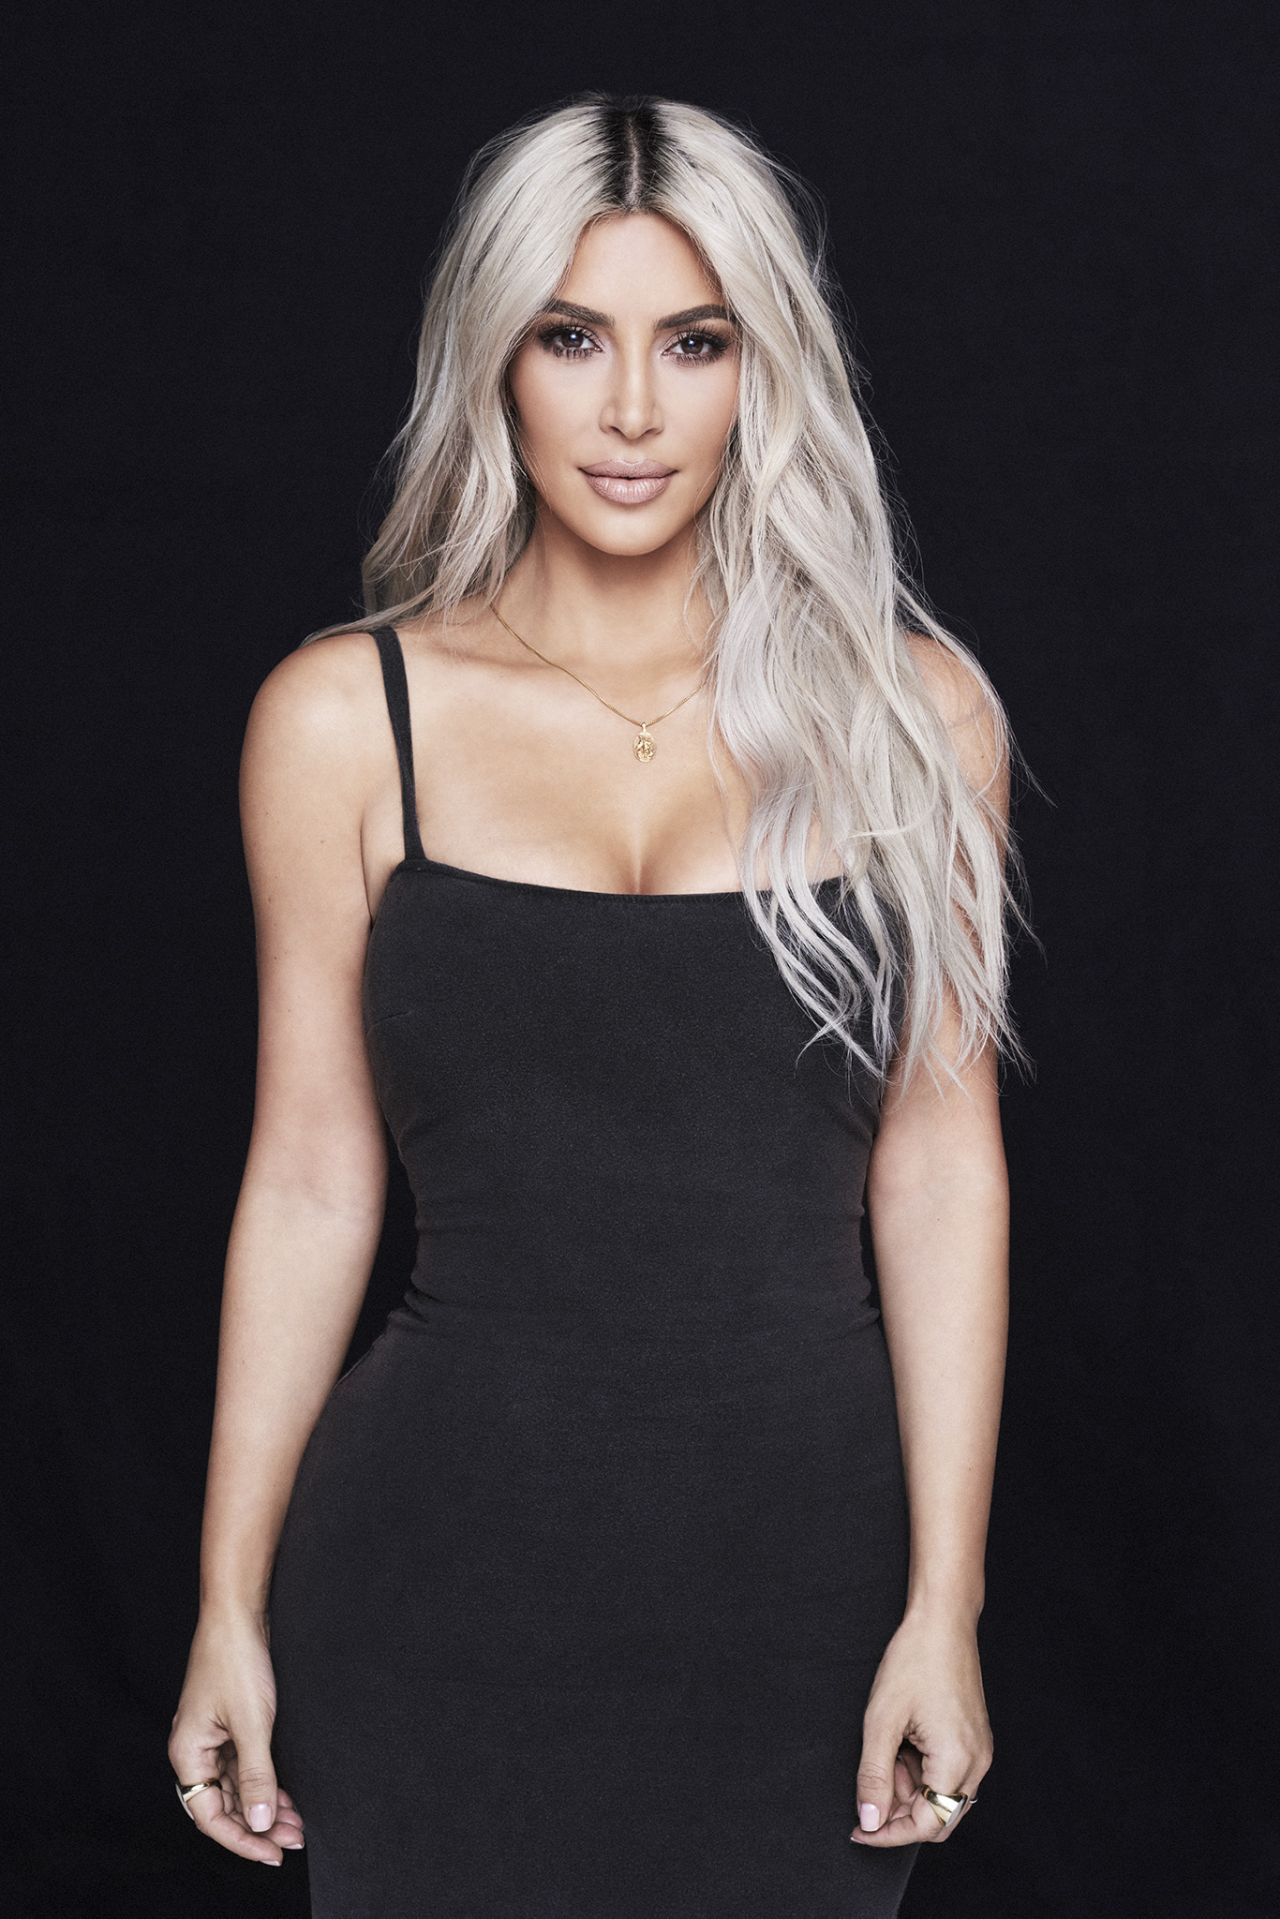 Image result for kim kardashian photoshoot | K-Dashian ...